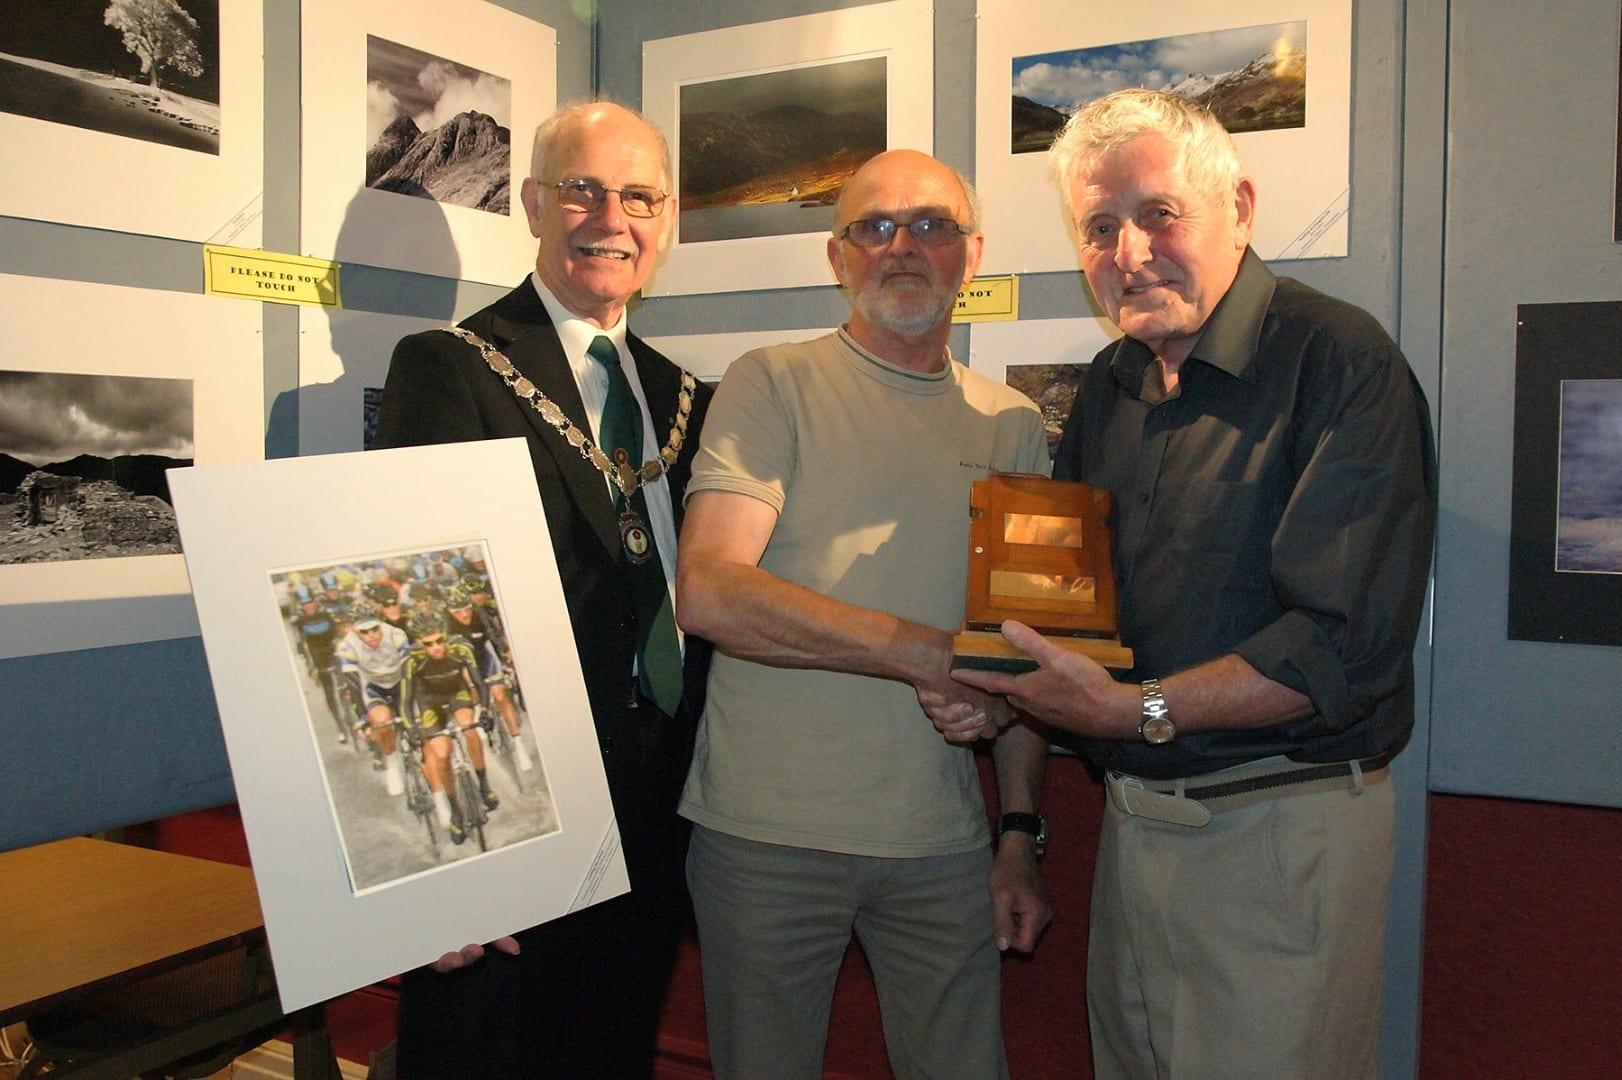 Poulton Photographic Society Exhibition